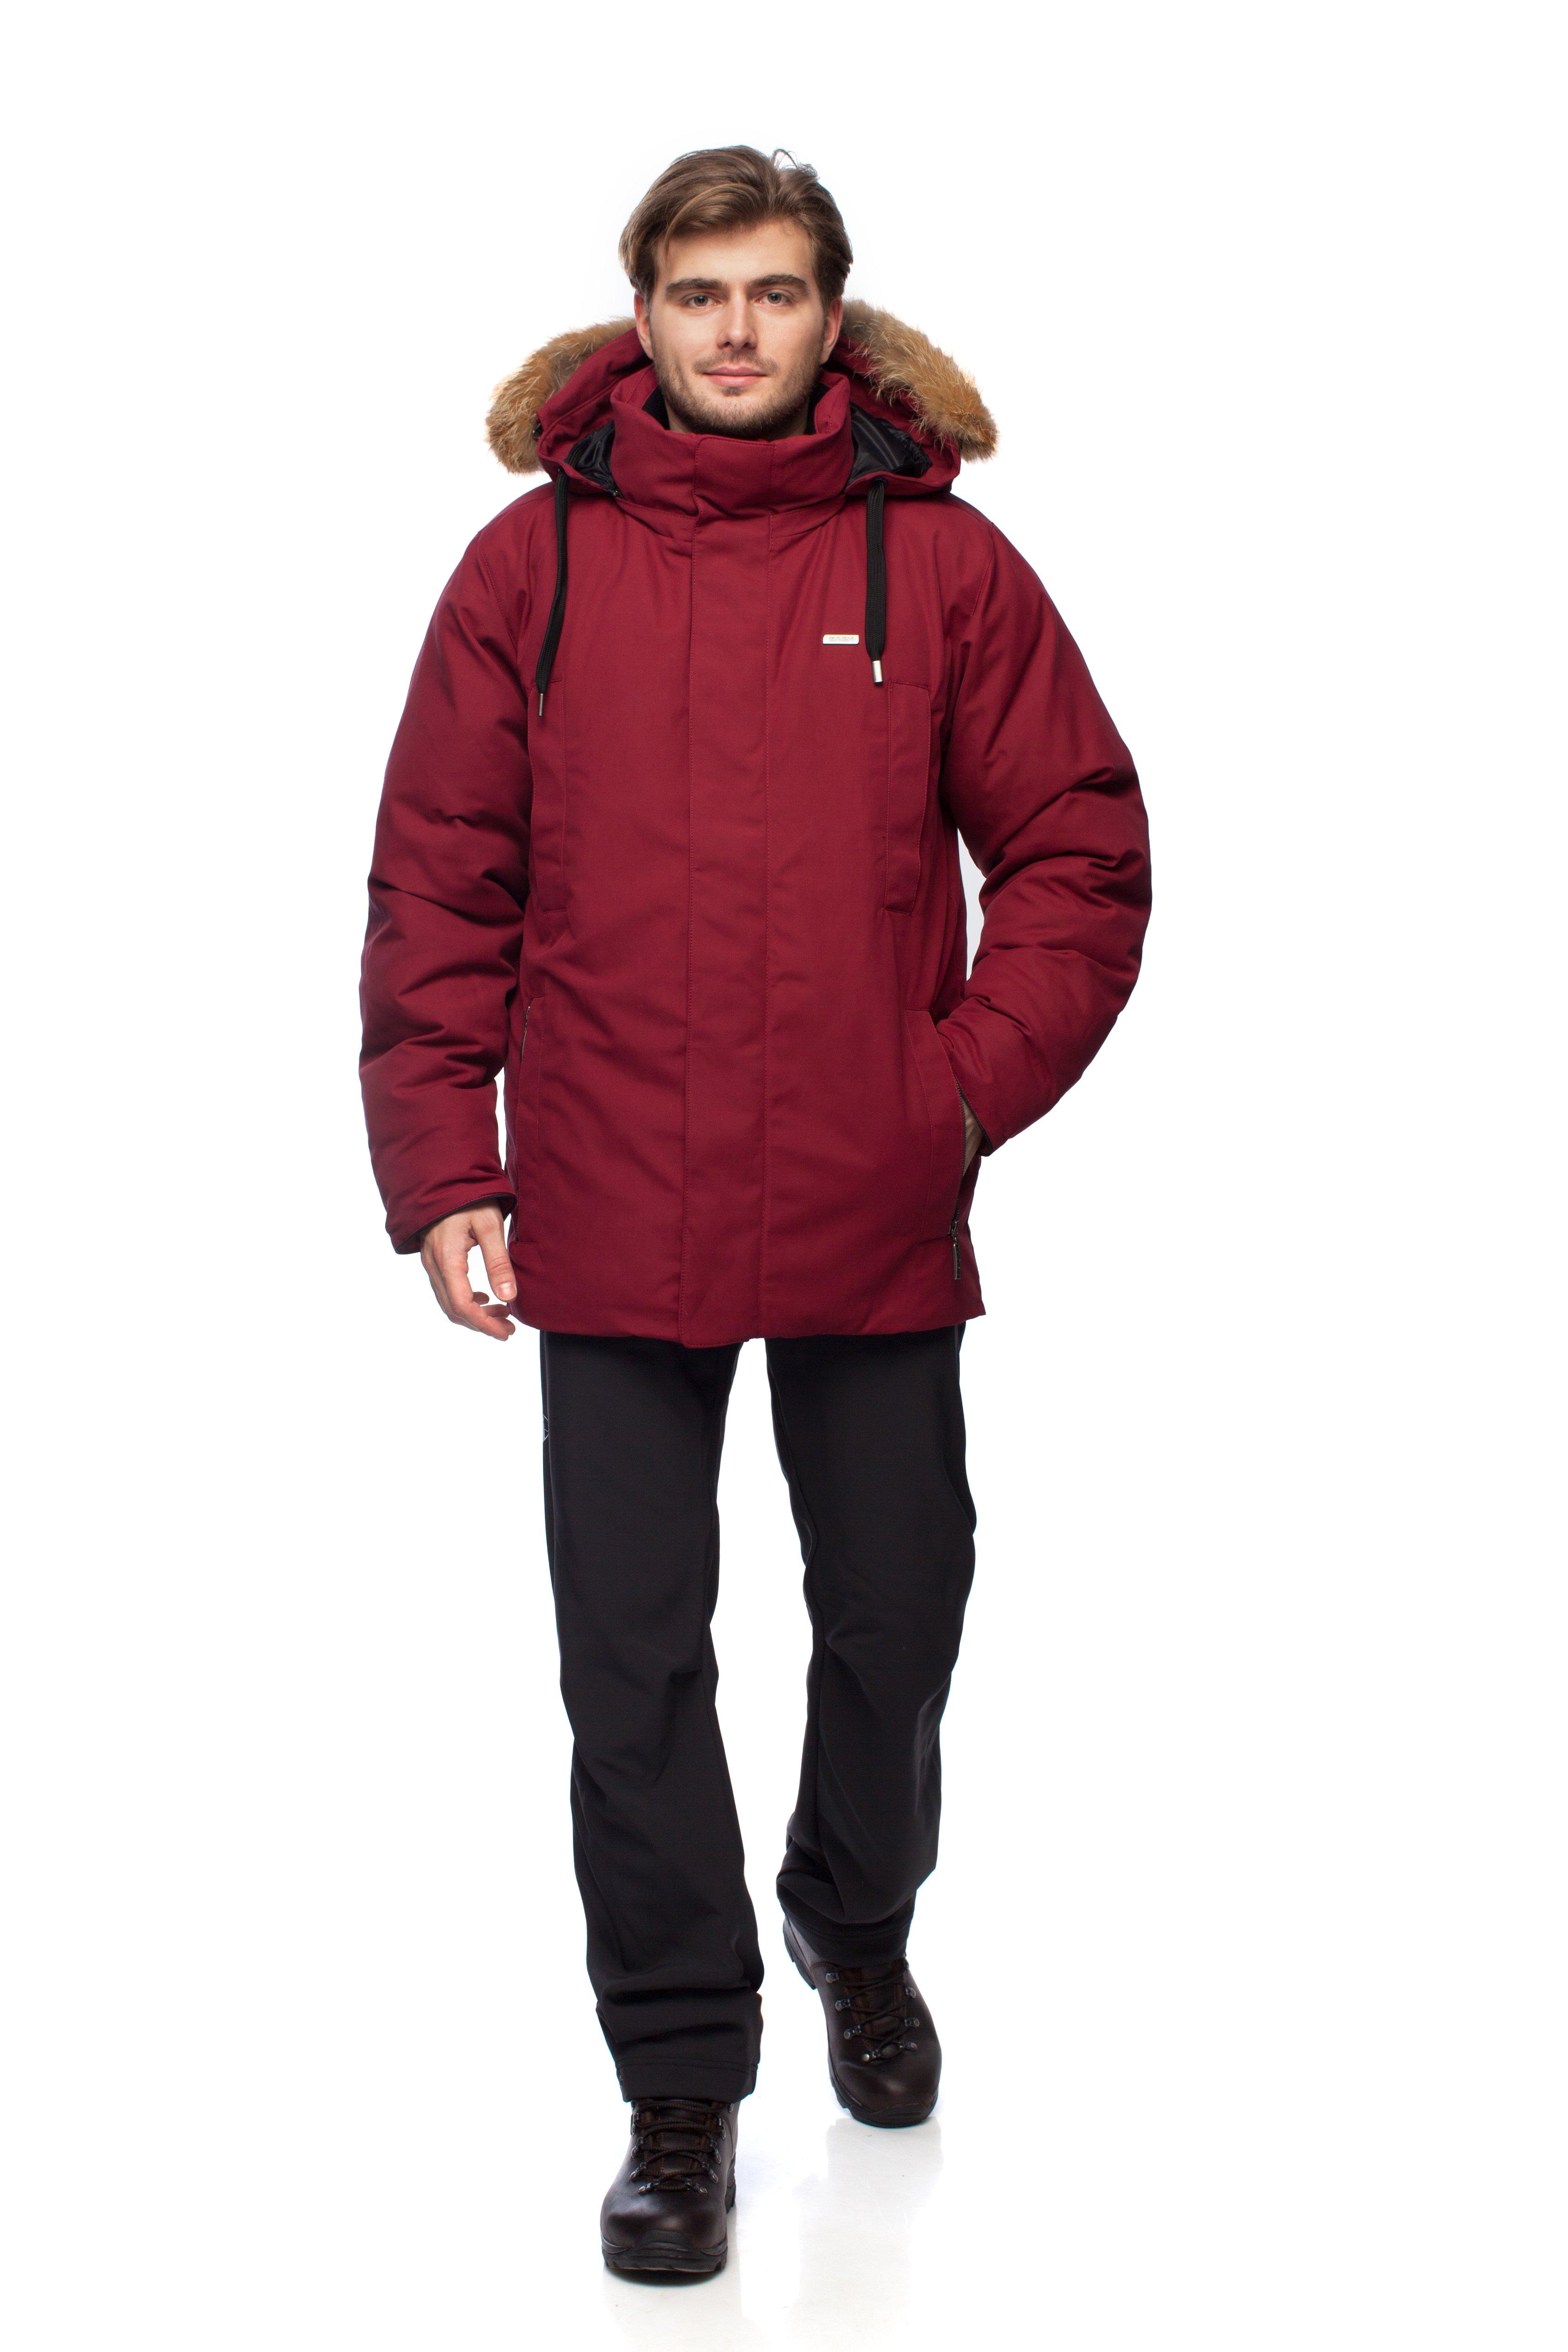 Пуховая куртка BASK ARGUT LUX фото